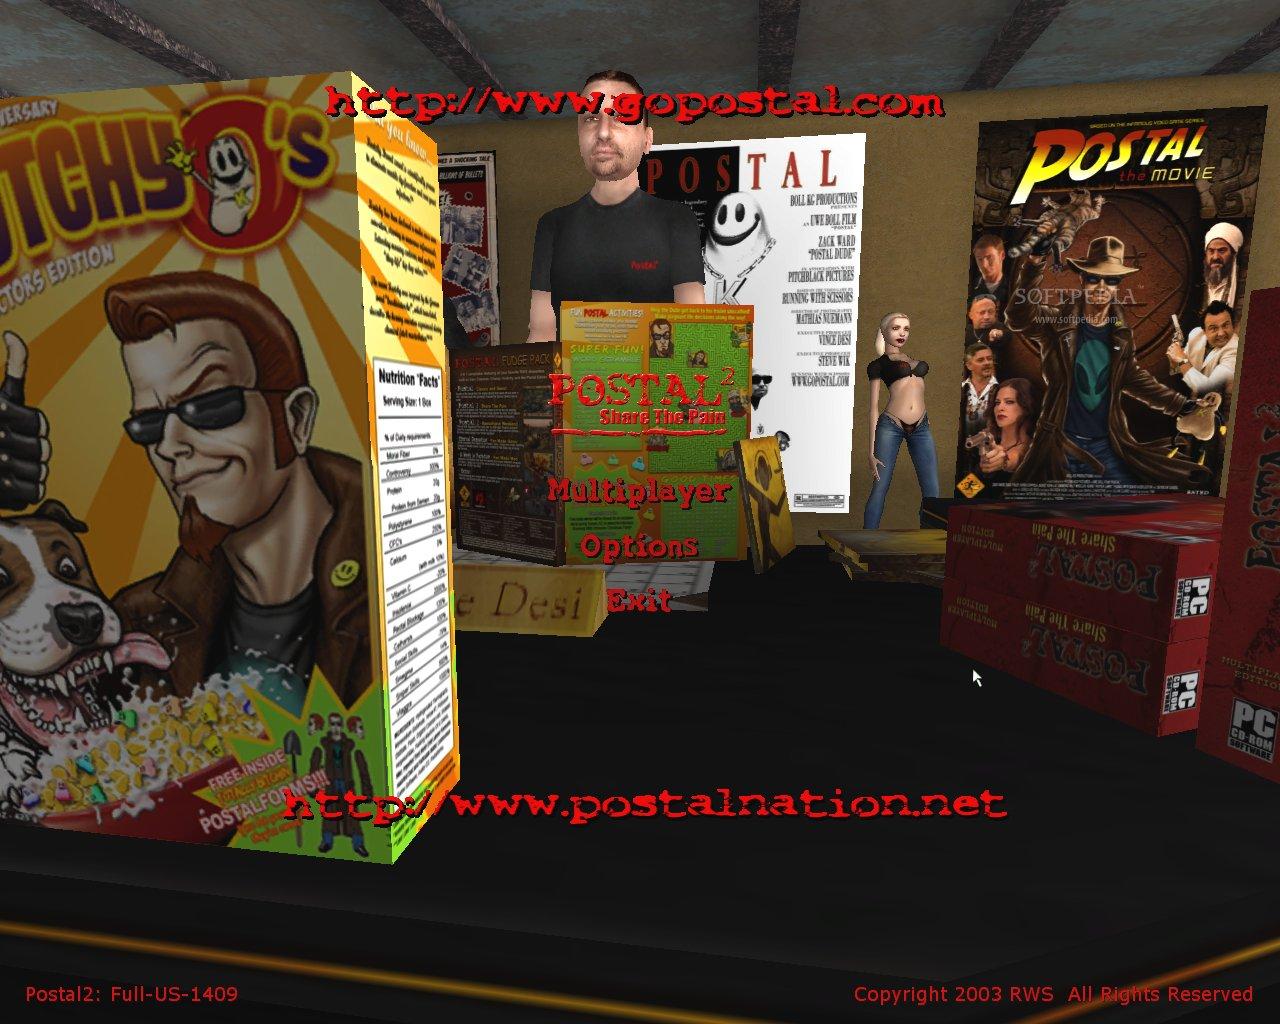 Ut2004 postal babes youtube.